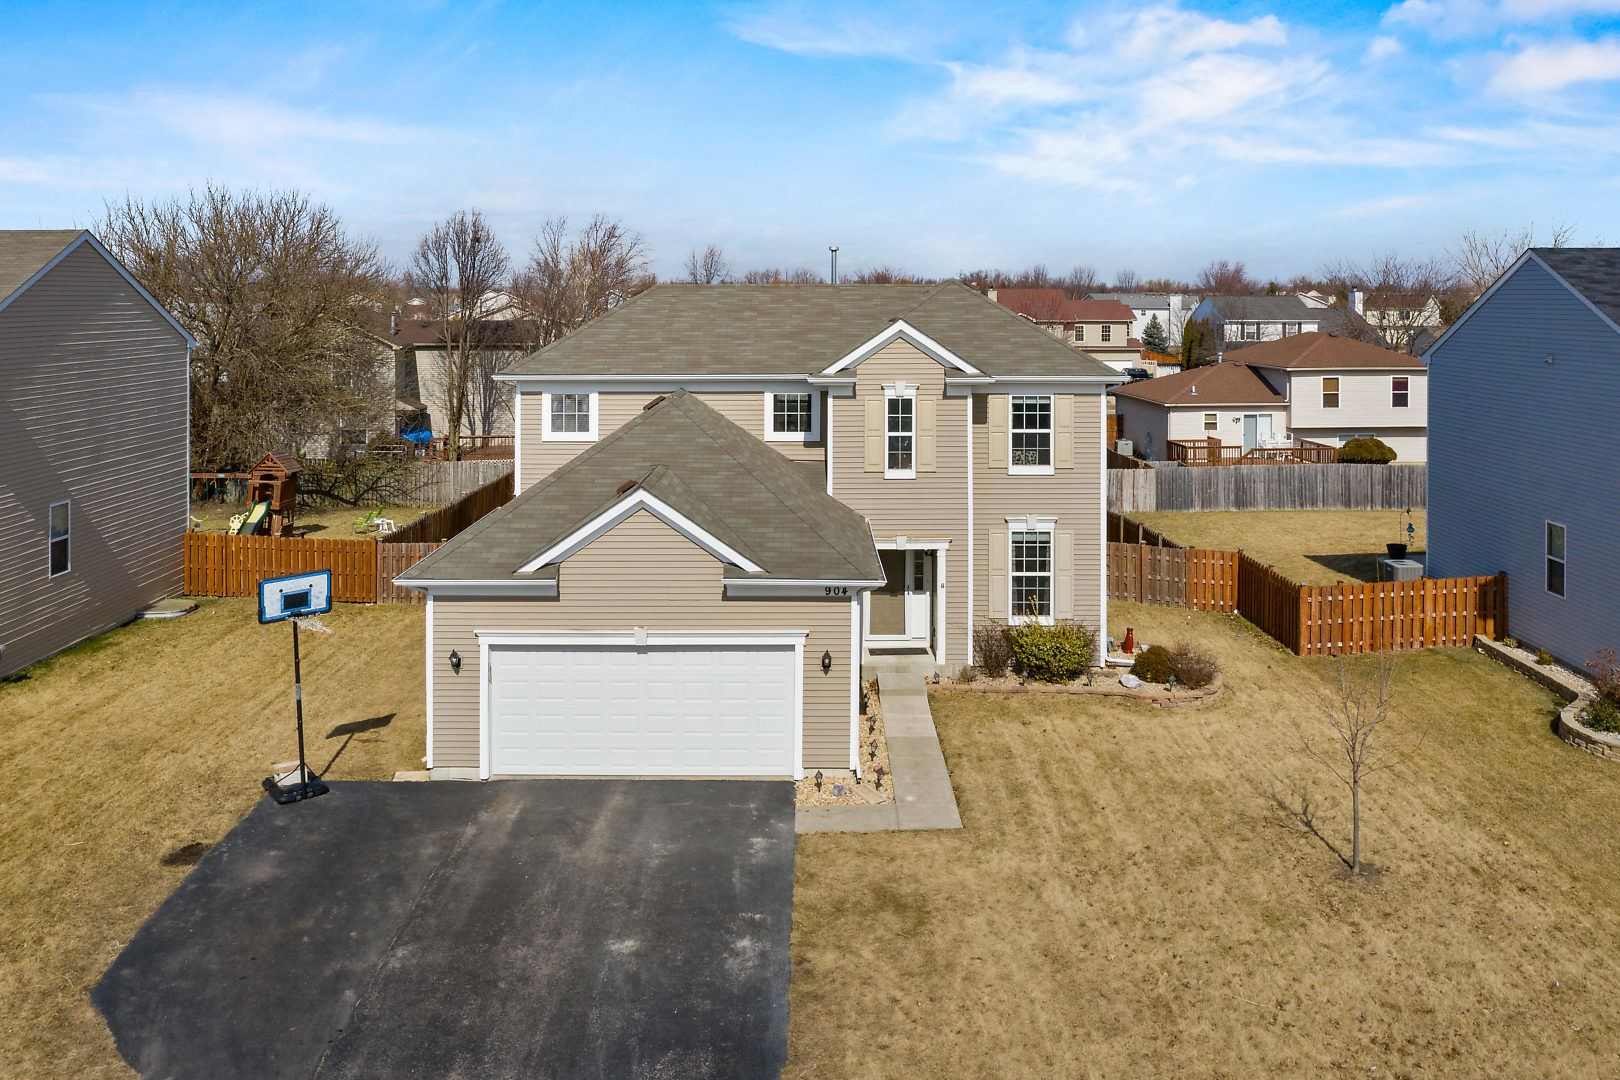 Photo of 904 Phelps Lane, Shorewood, IL 60404 (MLS # 10886553)